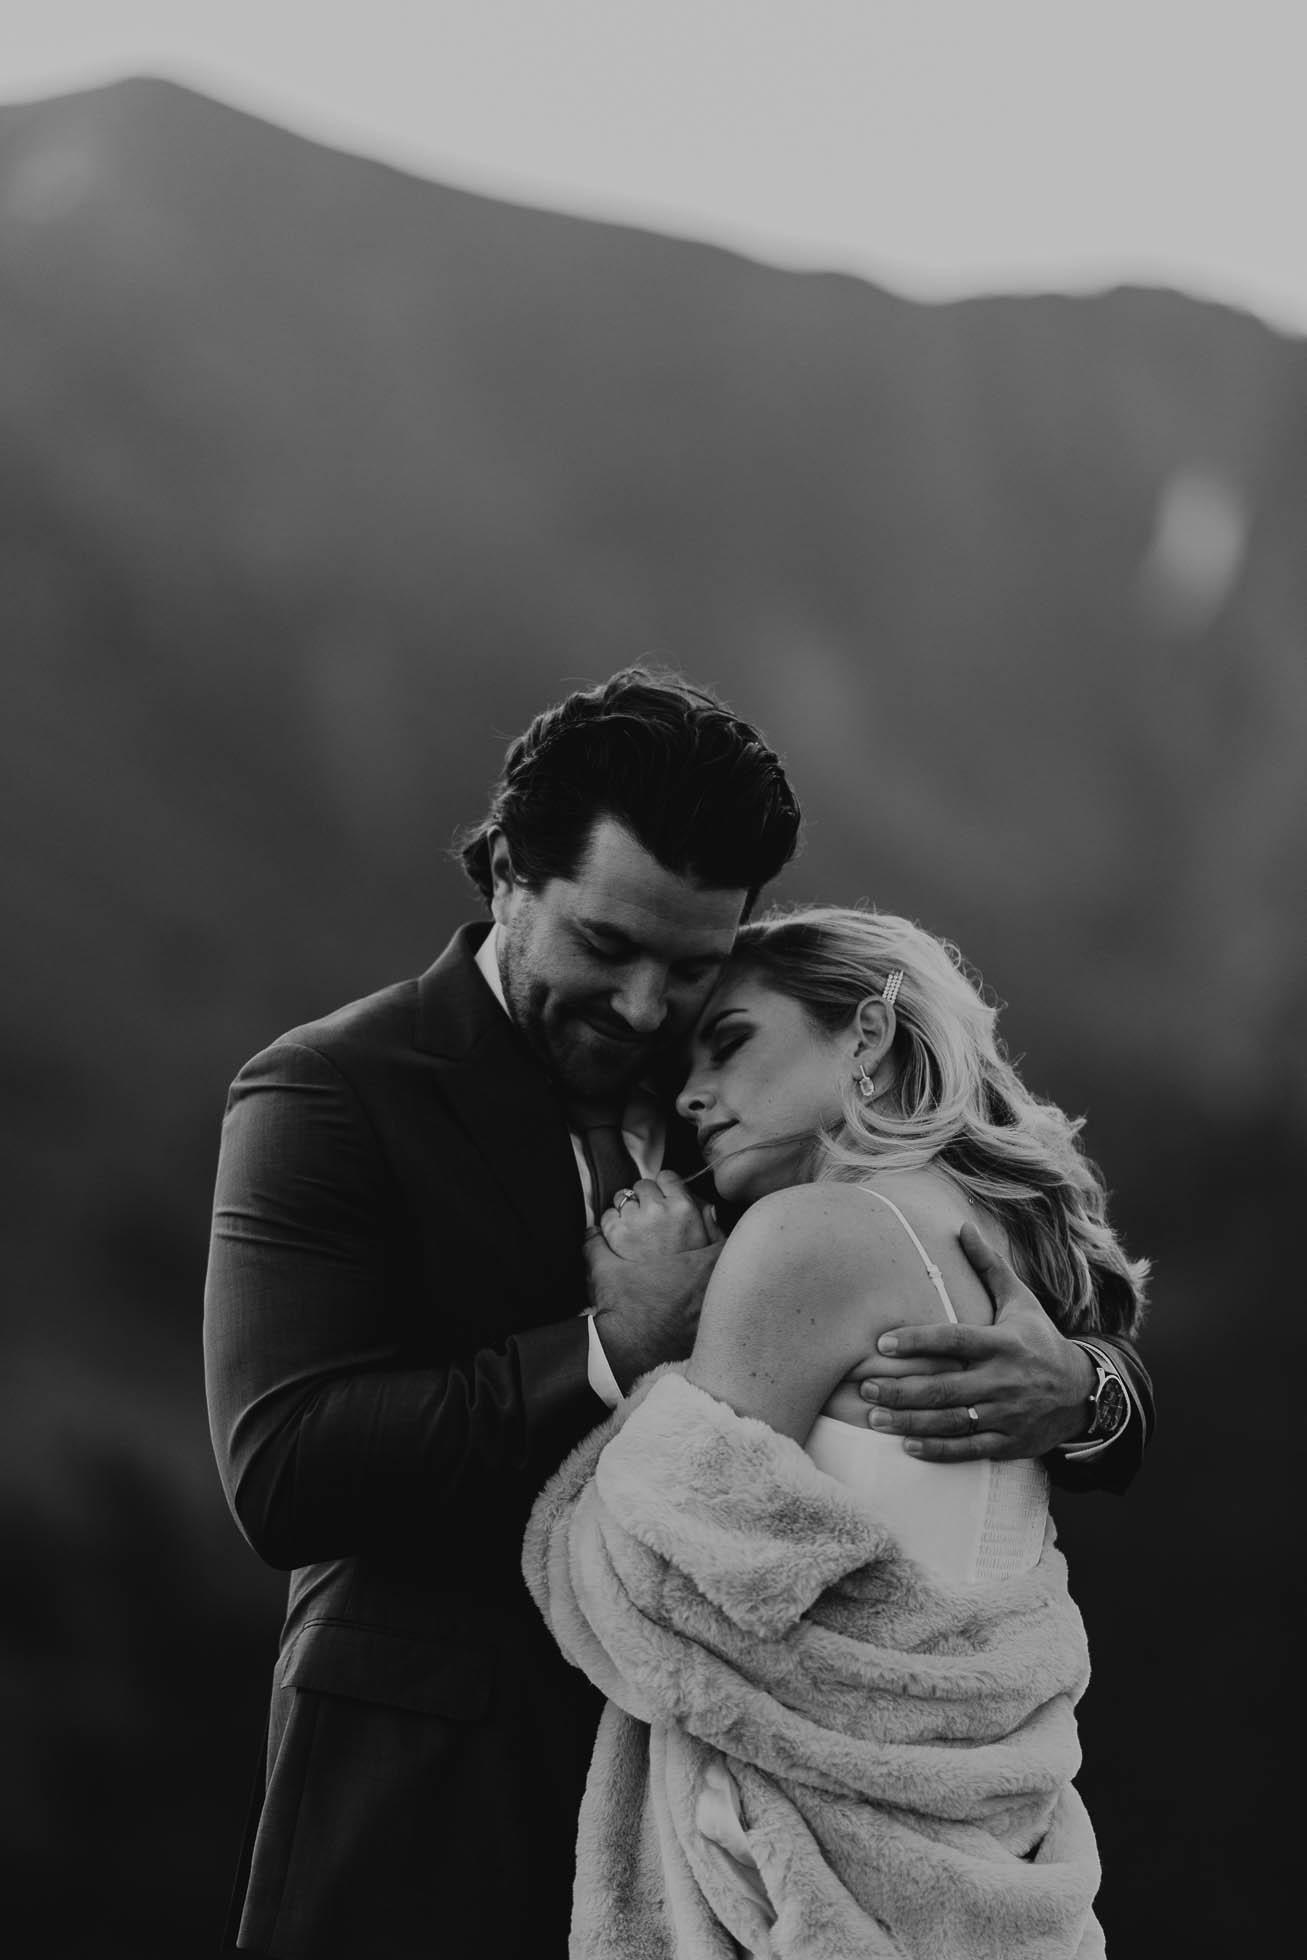 colorado-breckenridge-elopement-photographer-intimate-weddings-Justyna-E-Butler-Photography1